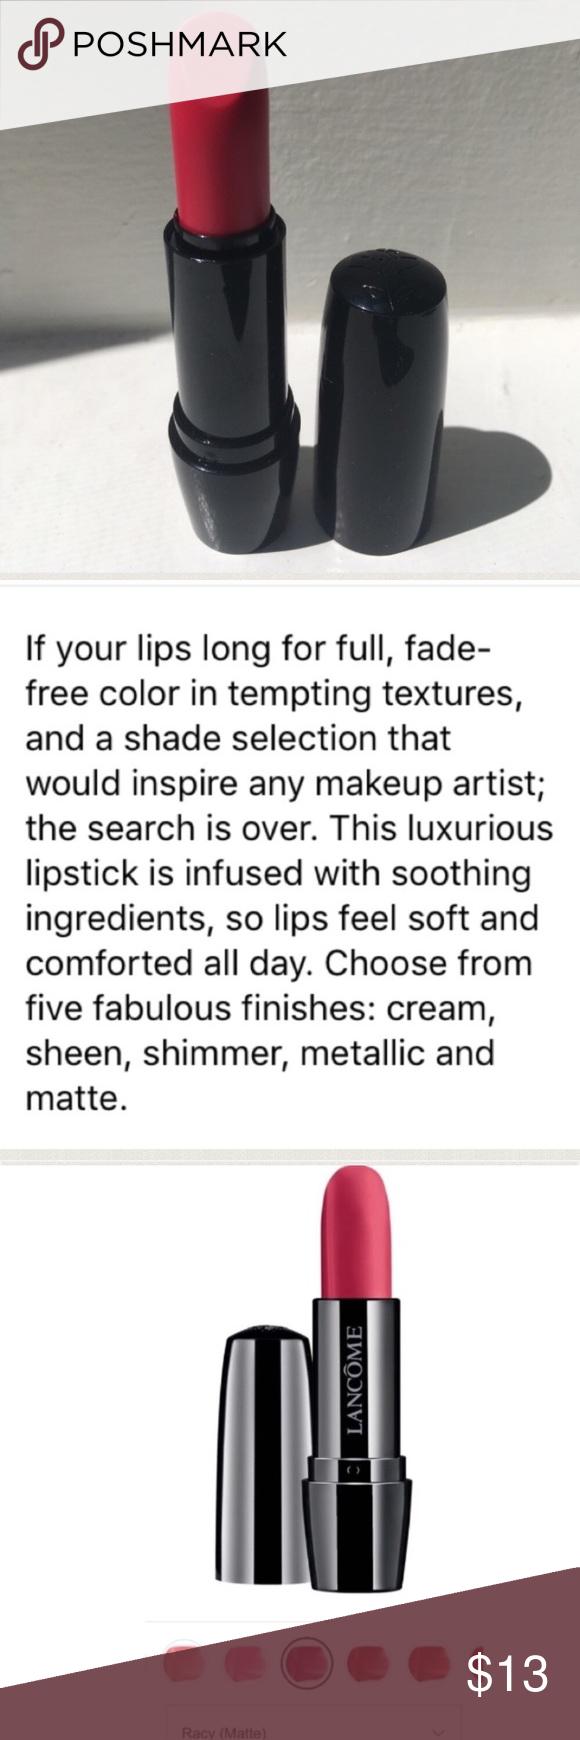 NEW💄Lancôme Lipstick in Racy(Matte) 🆕💄NEW💄Lancôme Color